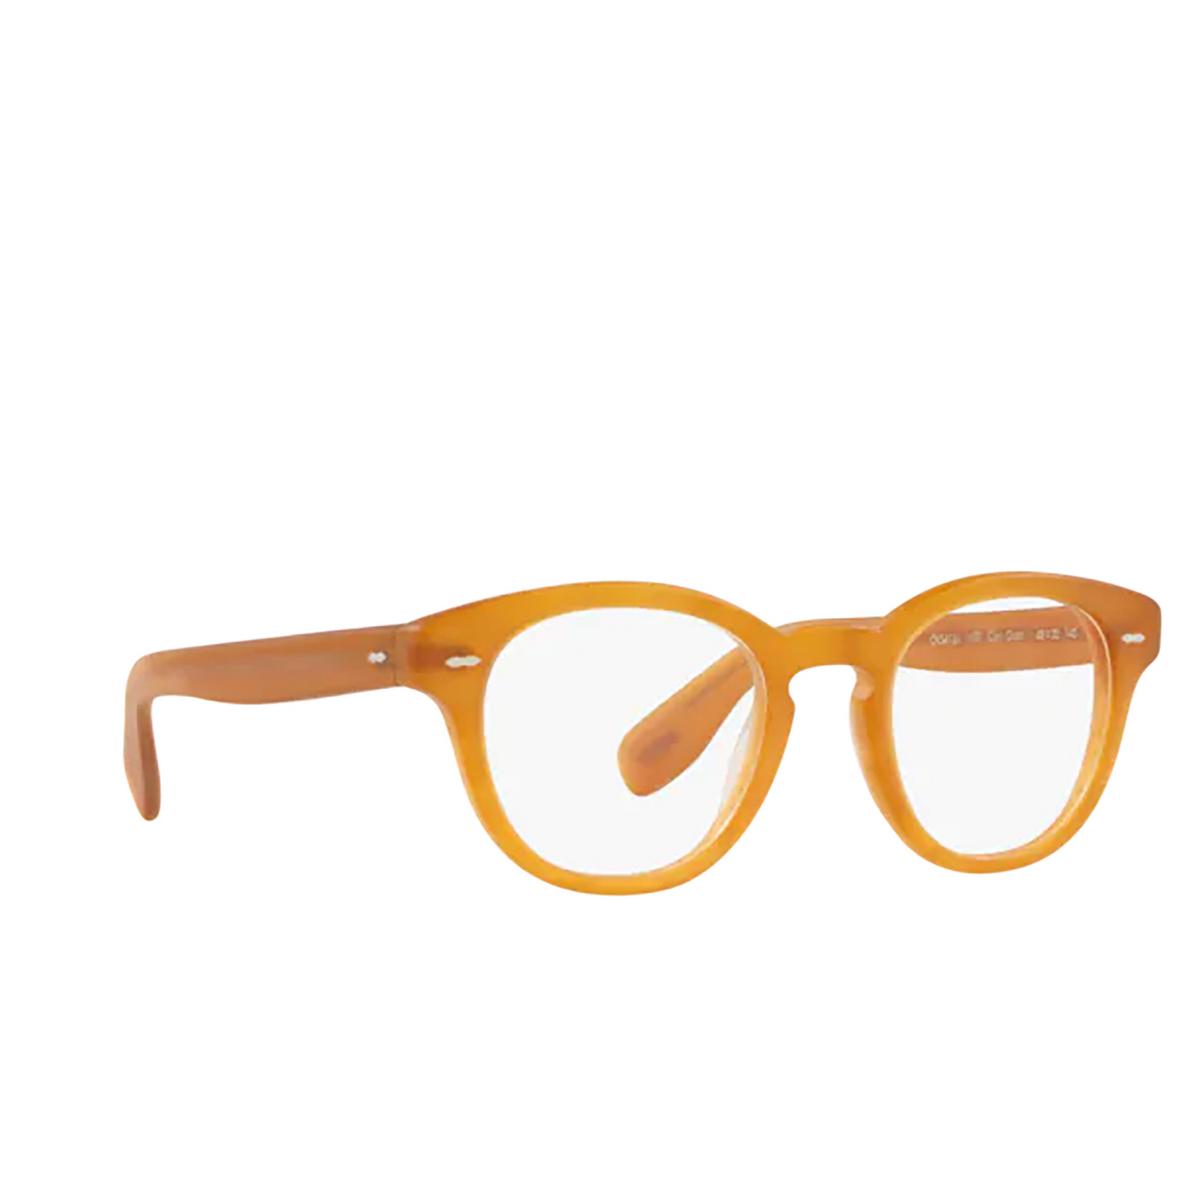 Oliver Peoples® Round Eyeglasses: Cary Grant OV5413U color Semi Matte Amber Tortoise 1699 - three-quarters view.